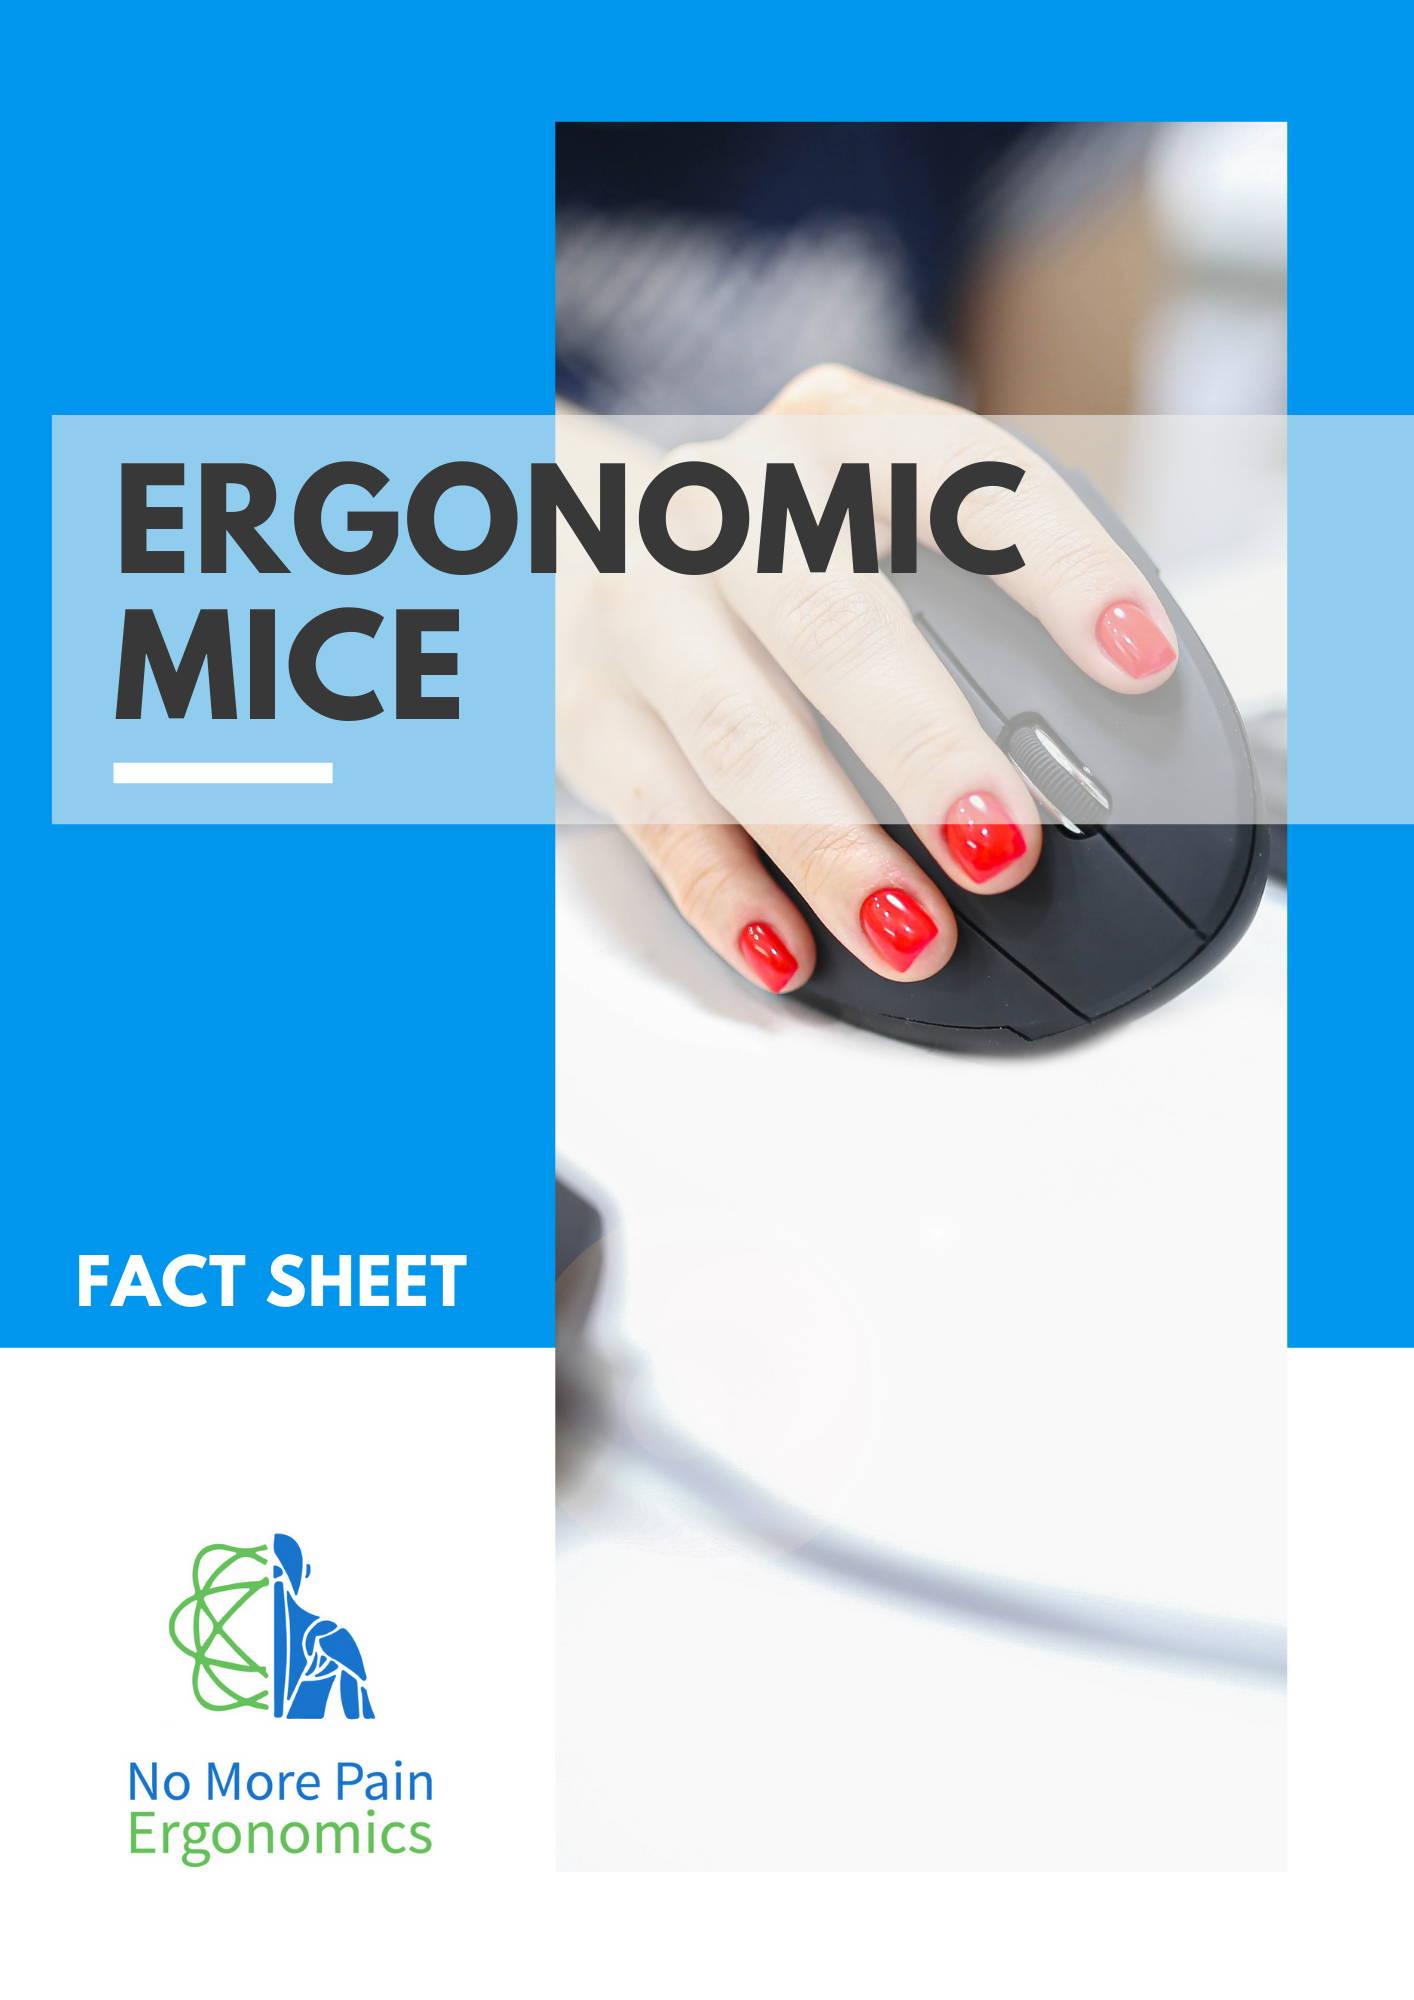 ergonomic mice fact sheet resource guide